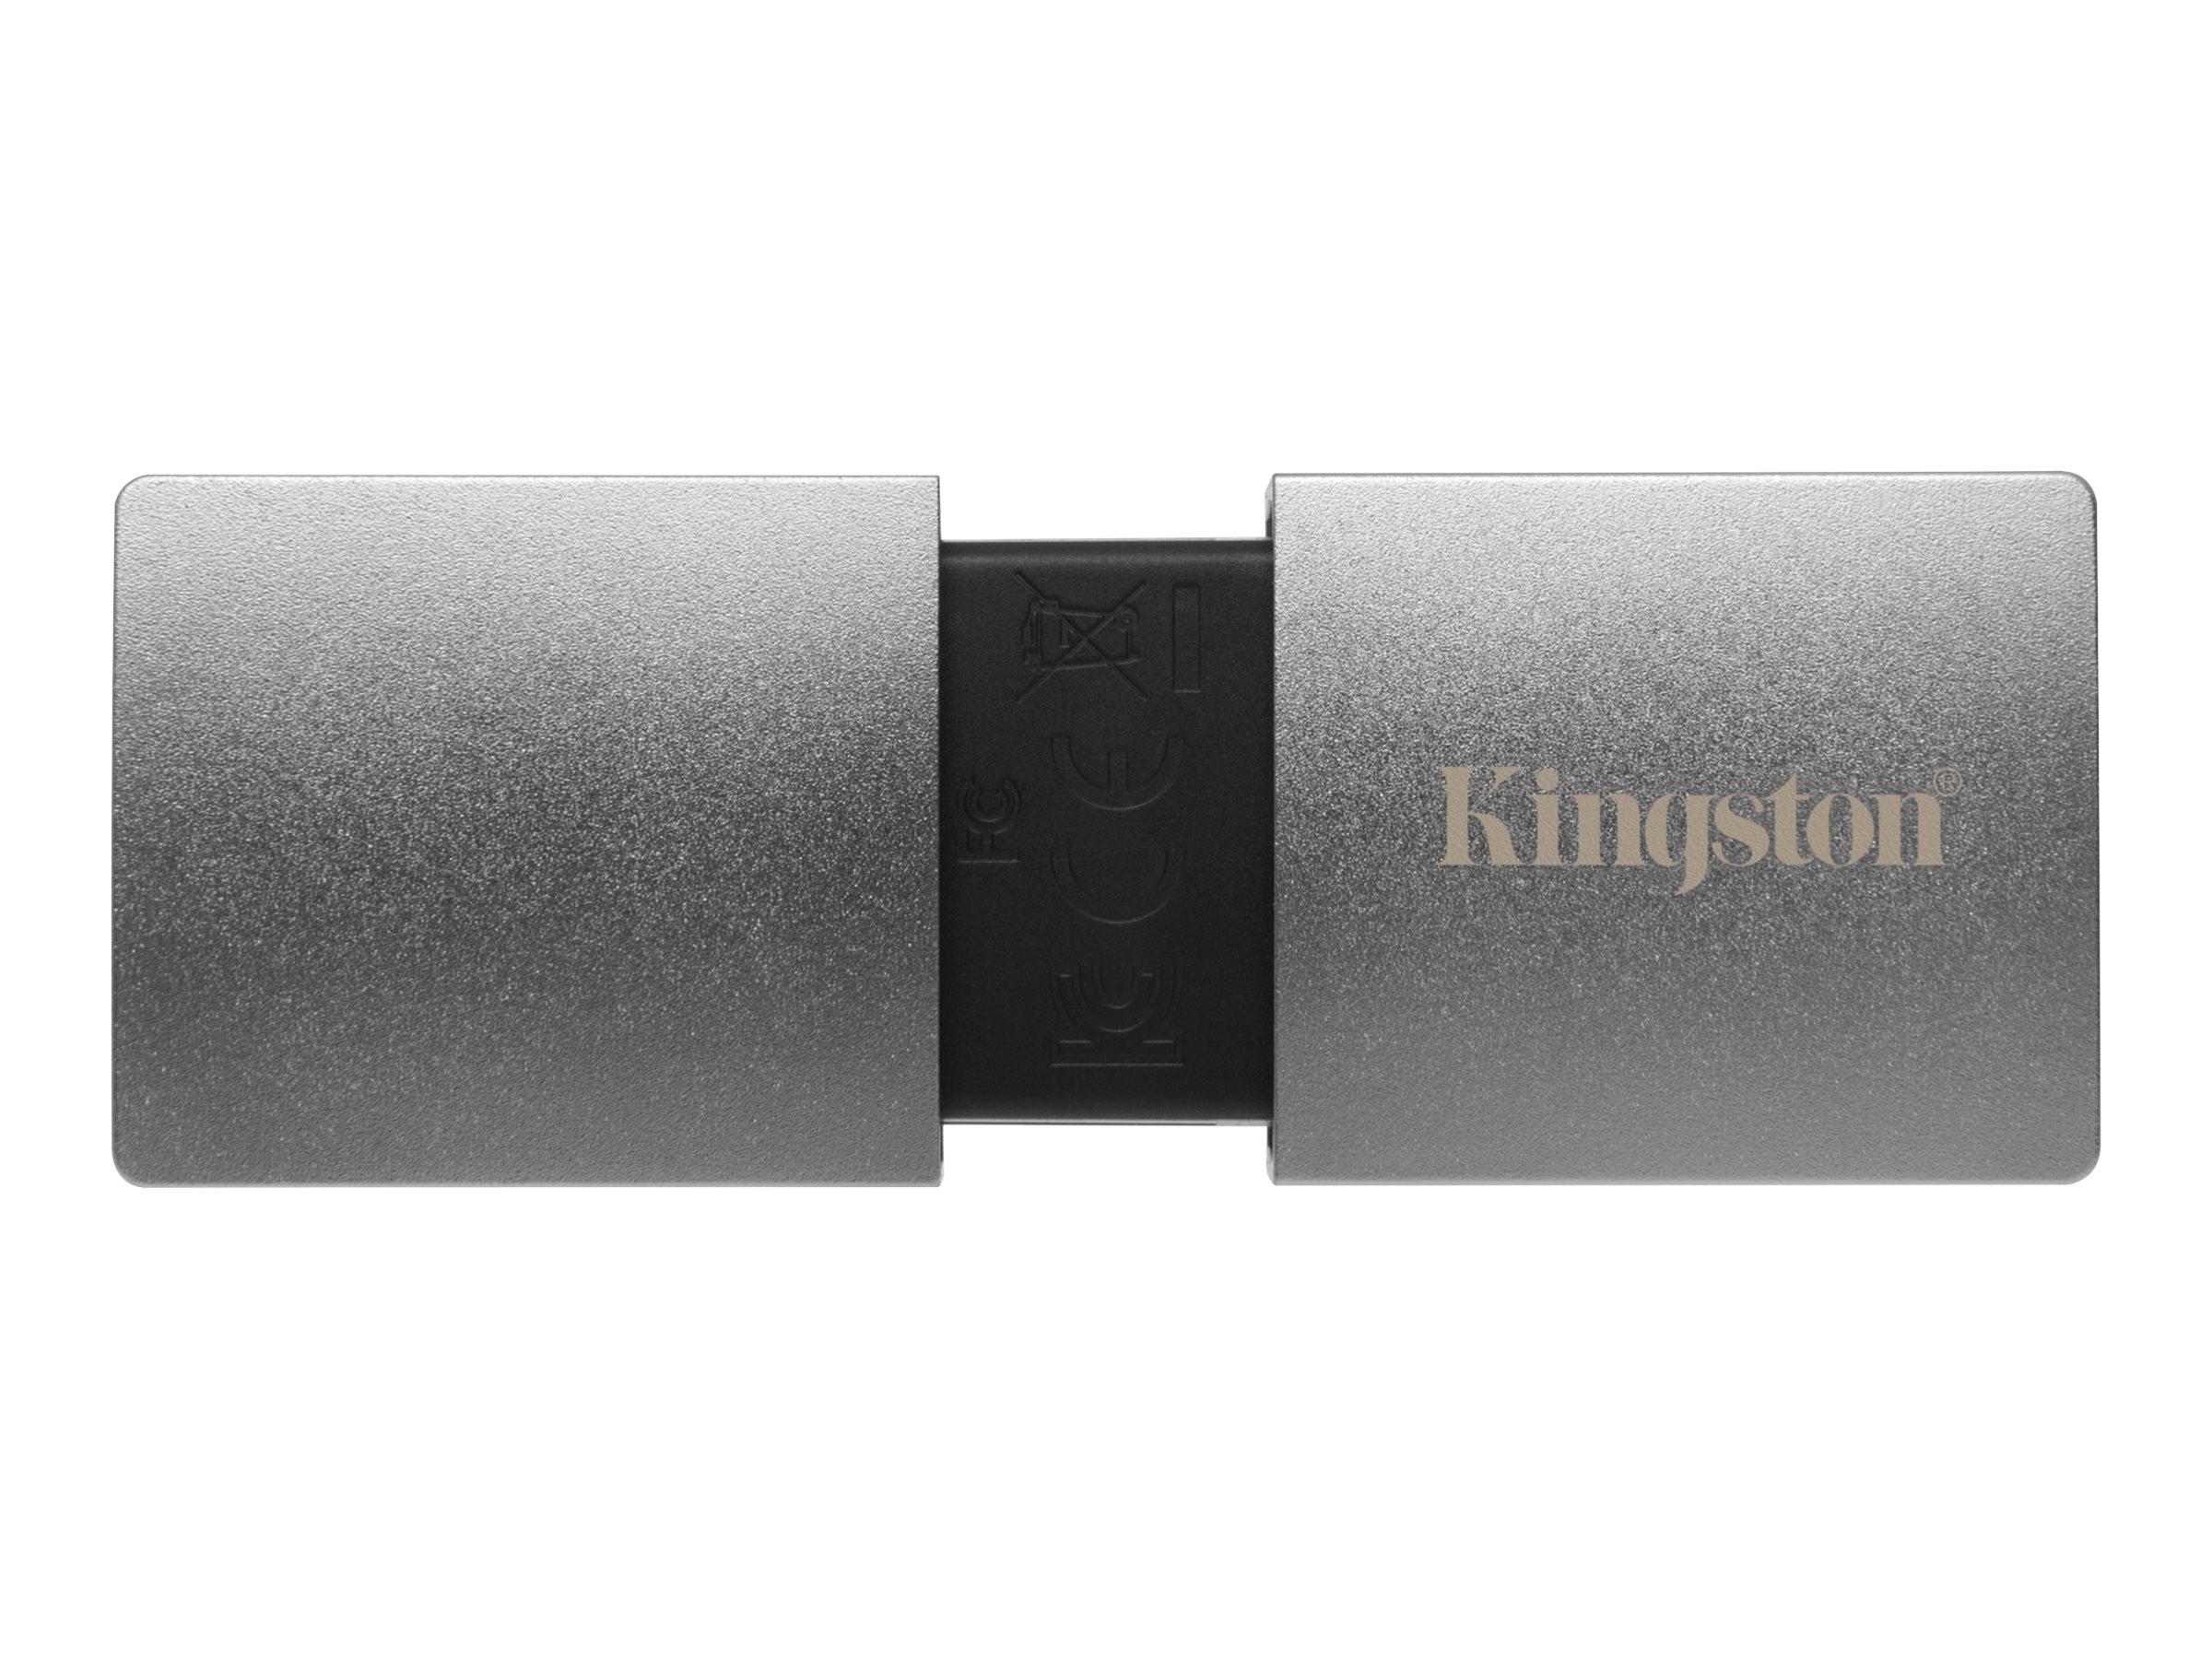 Kingston DataTraveler Ultimate GT - USB-Flash-Laufwerk - 1 TB - USB 3.1